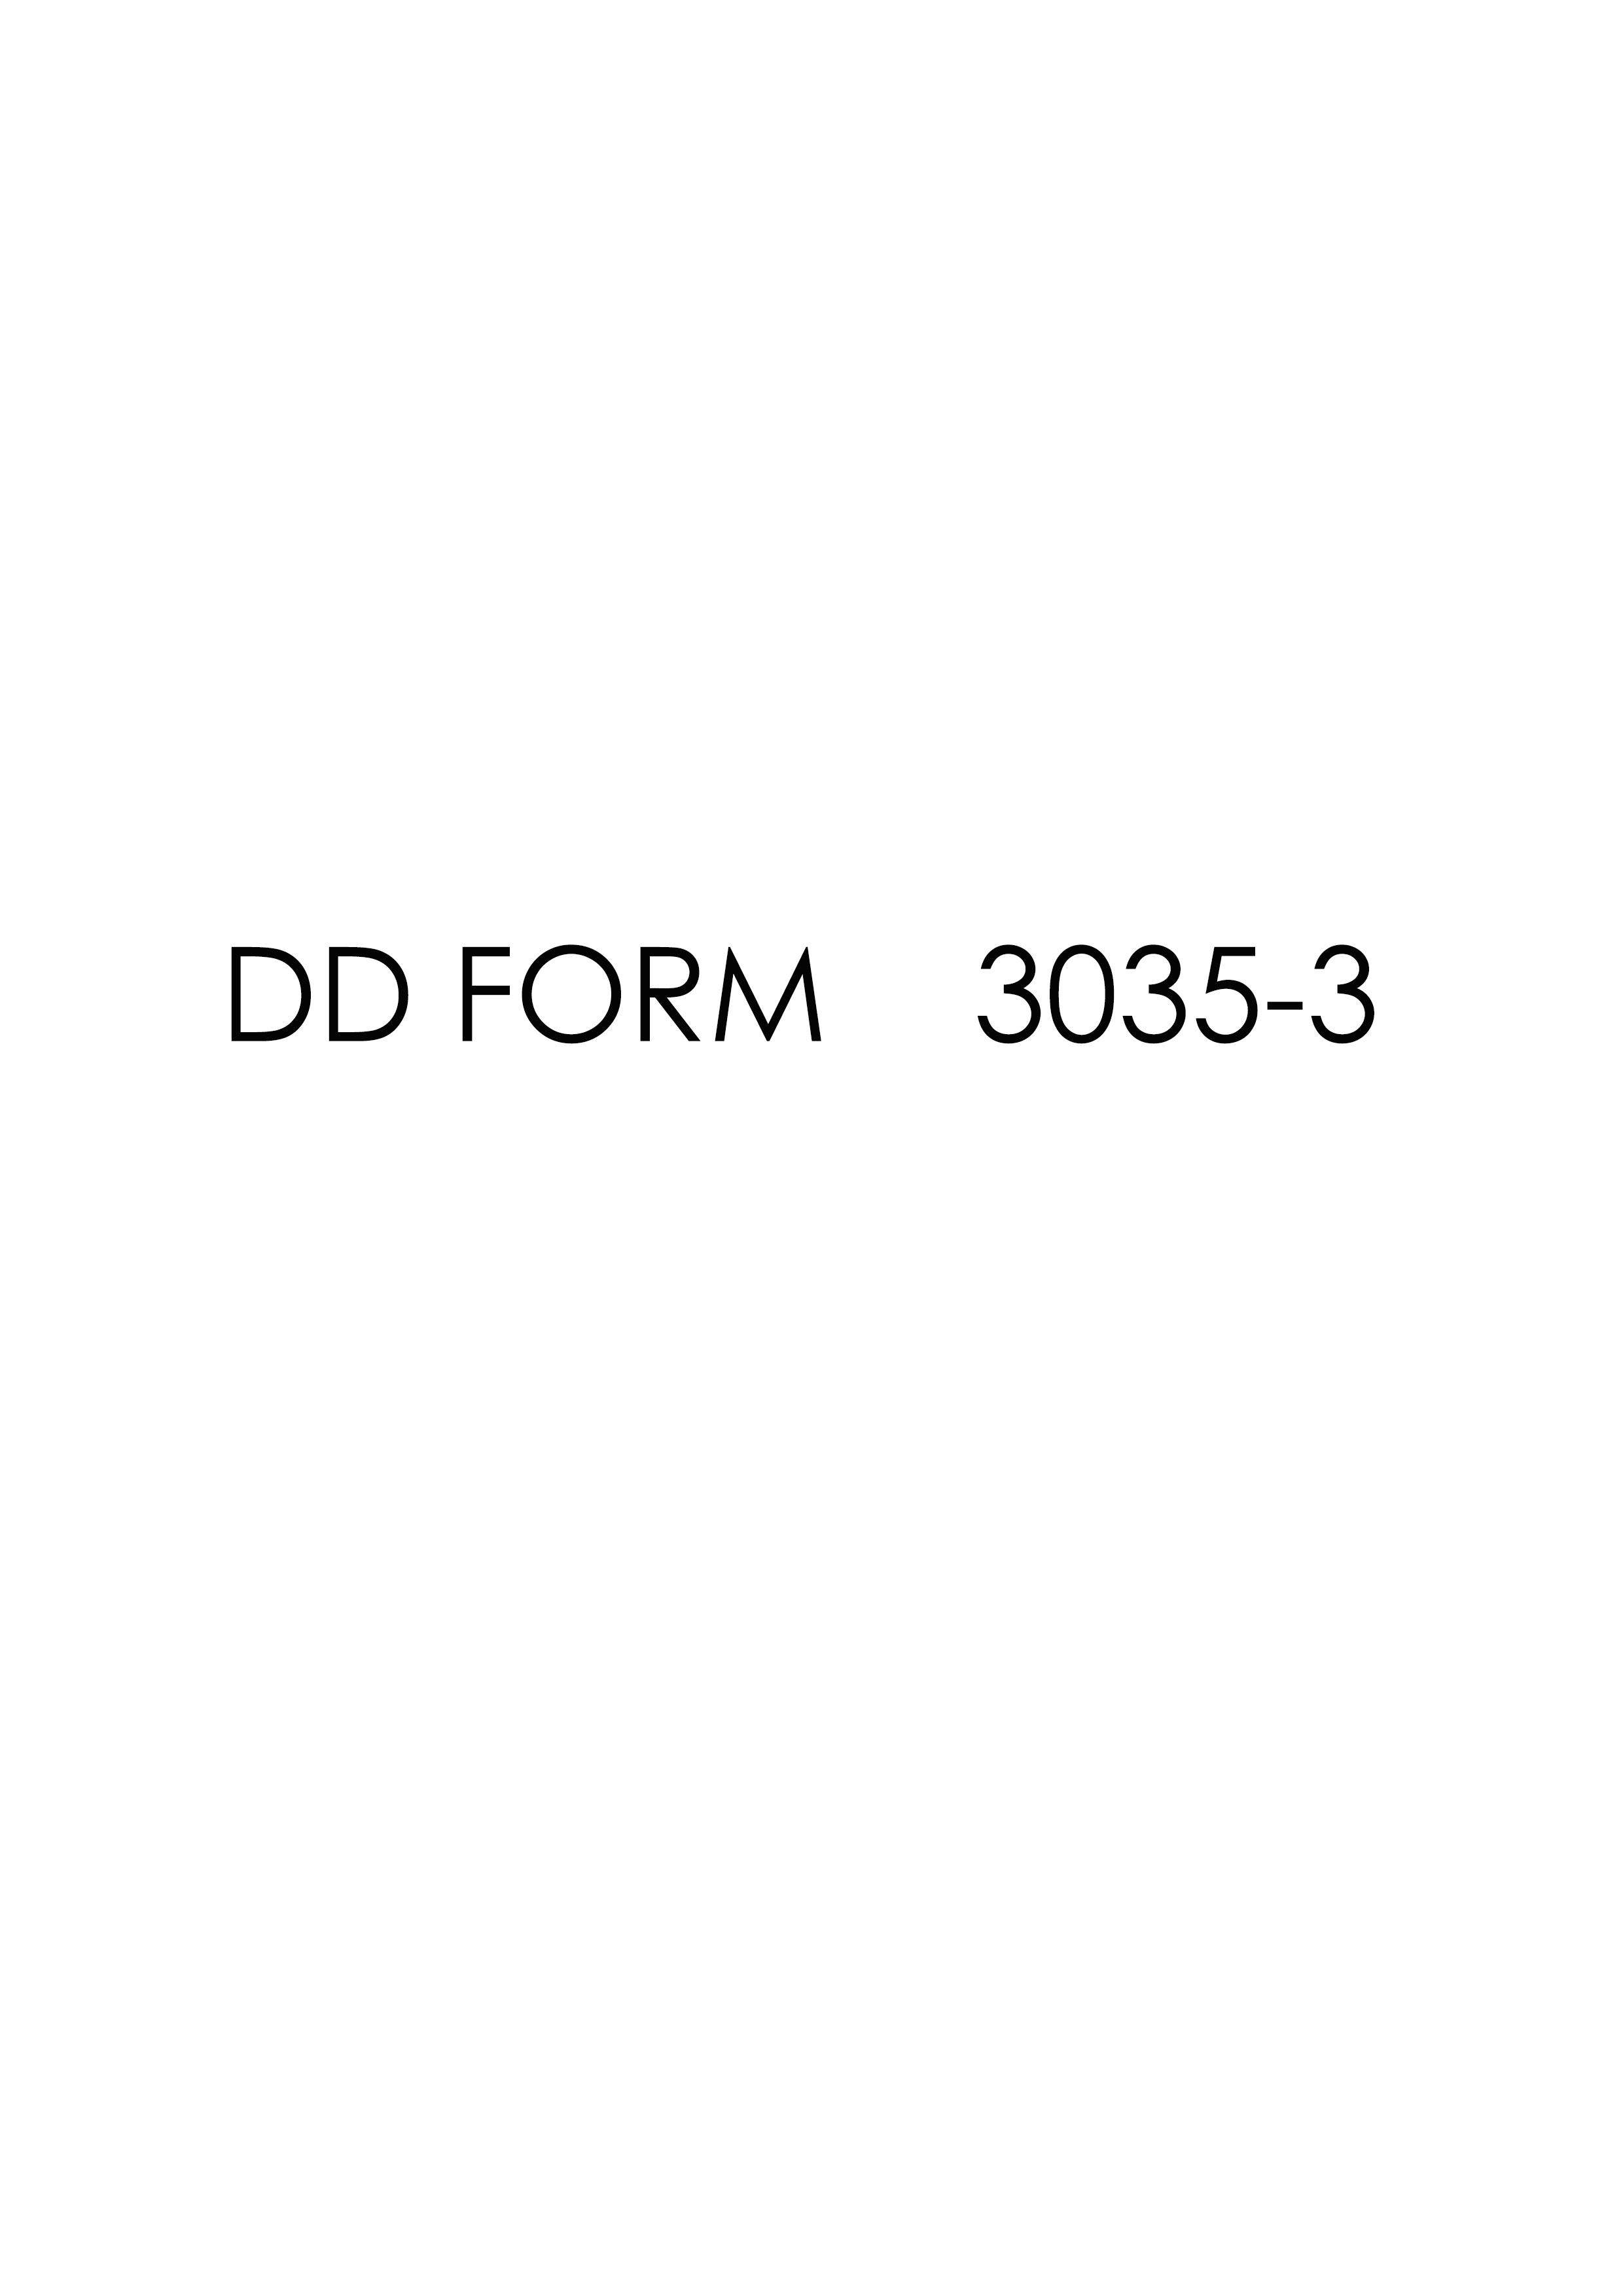 Download dd Form 3035-3 Free